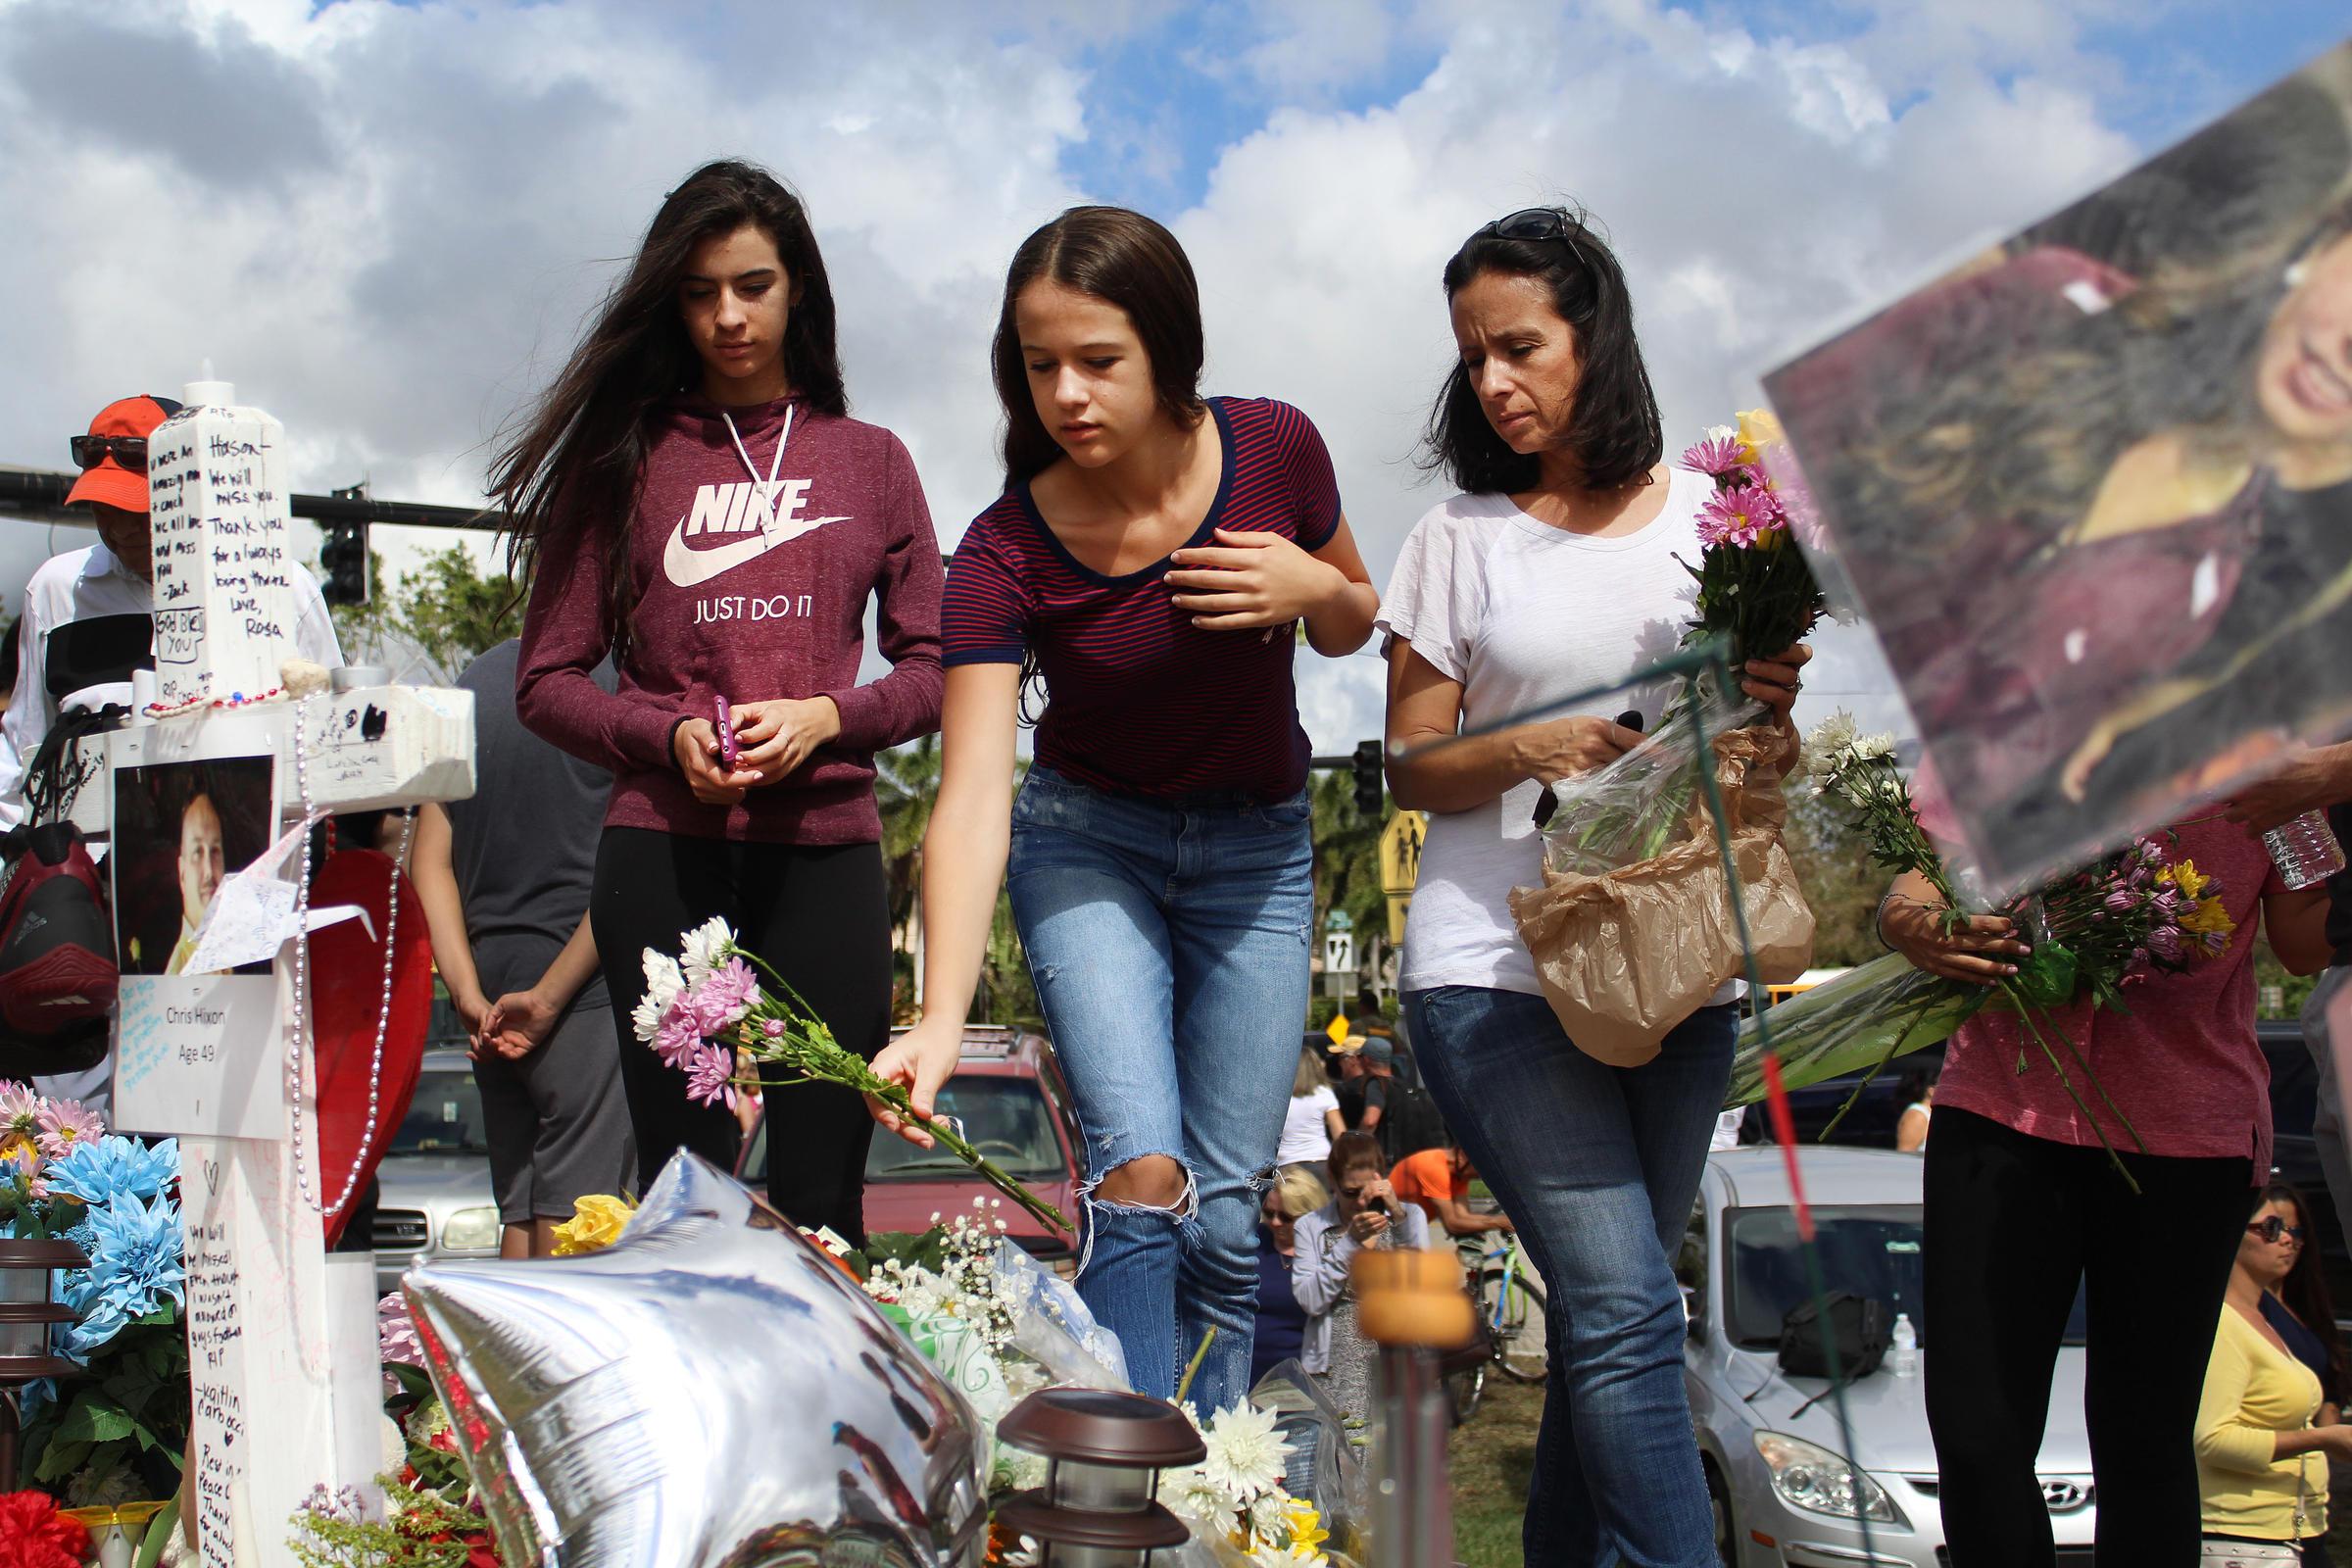 Florida students 'demand change' on gun laws